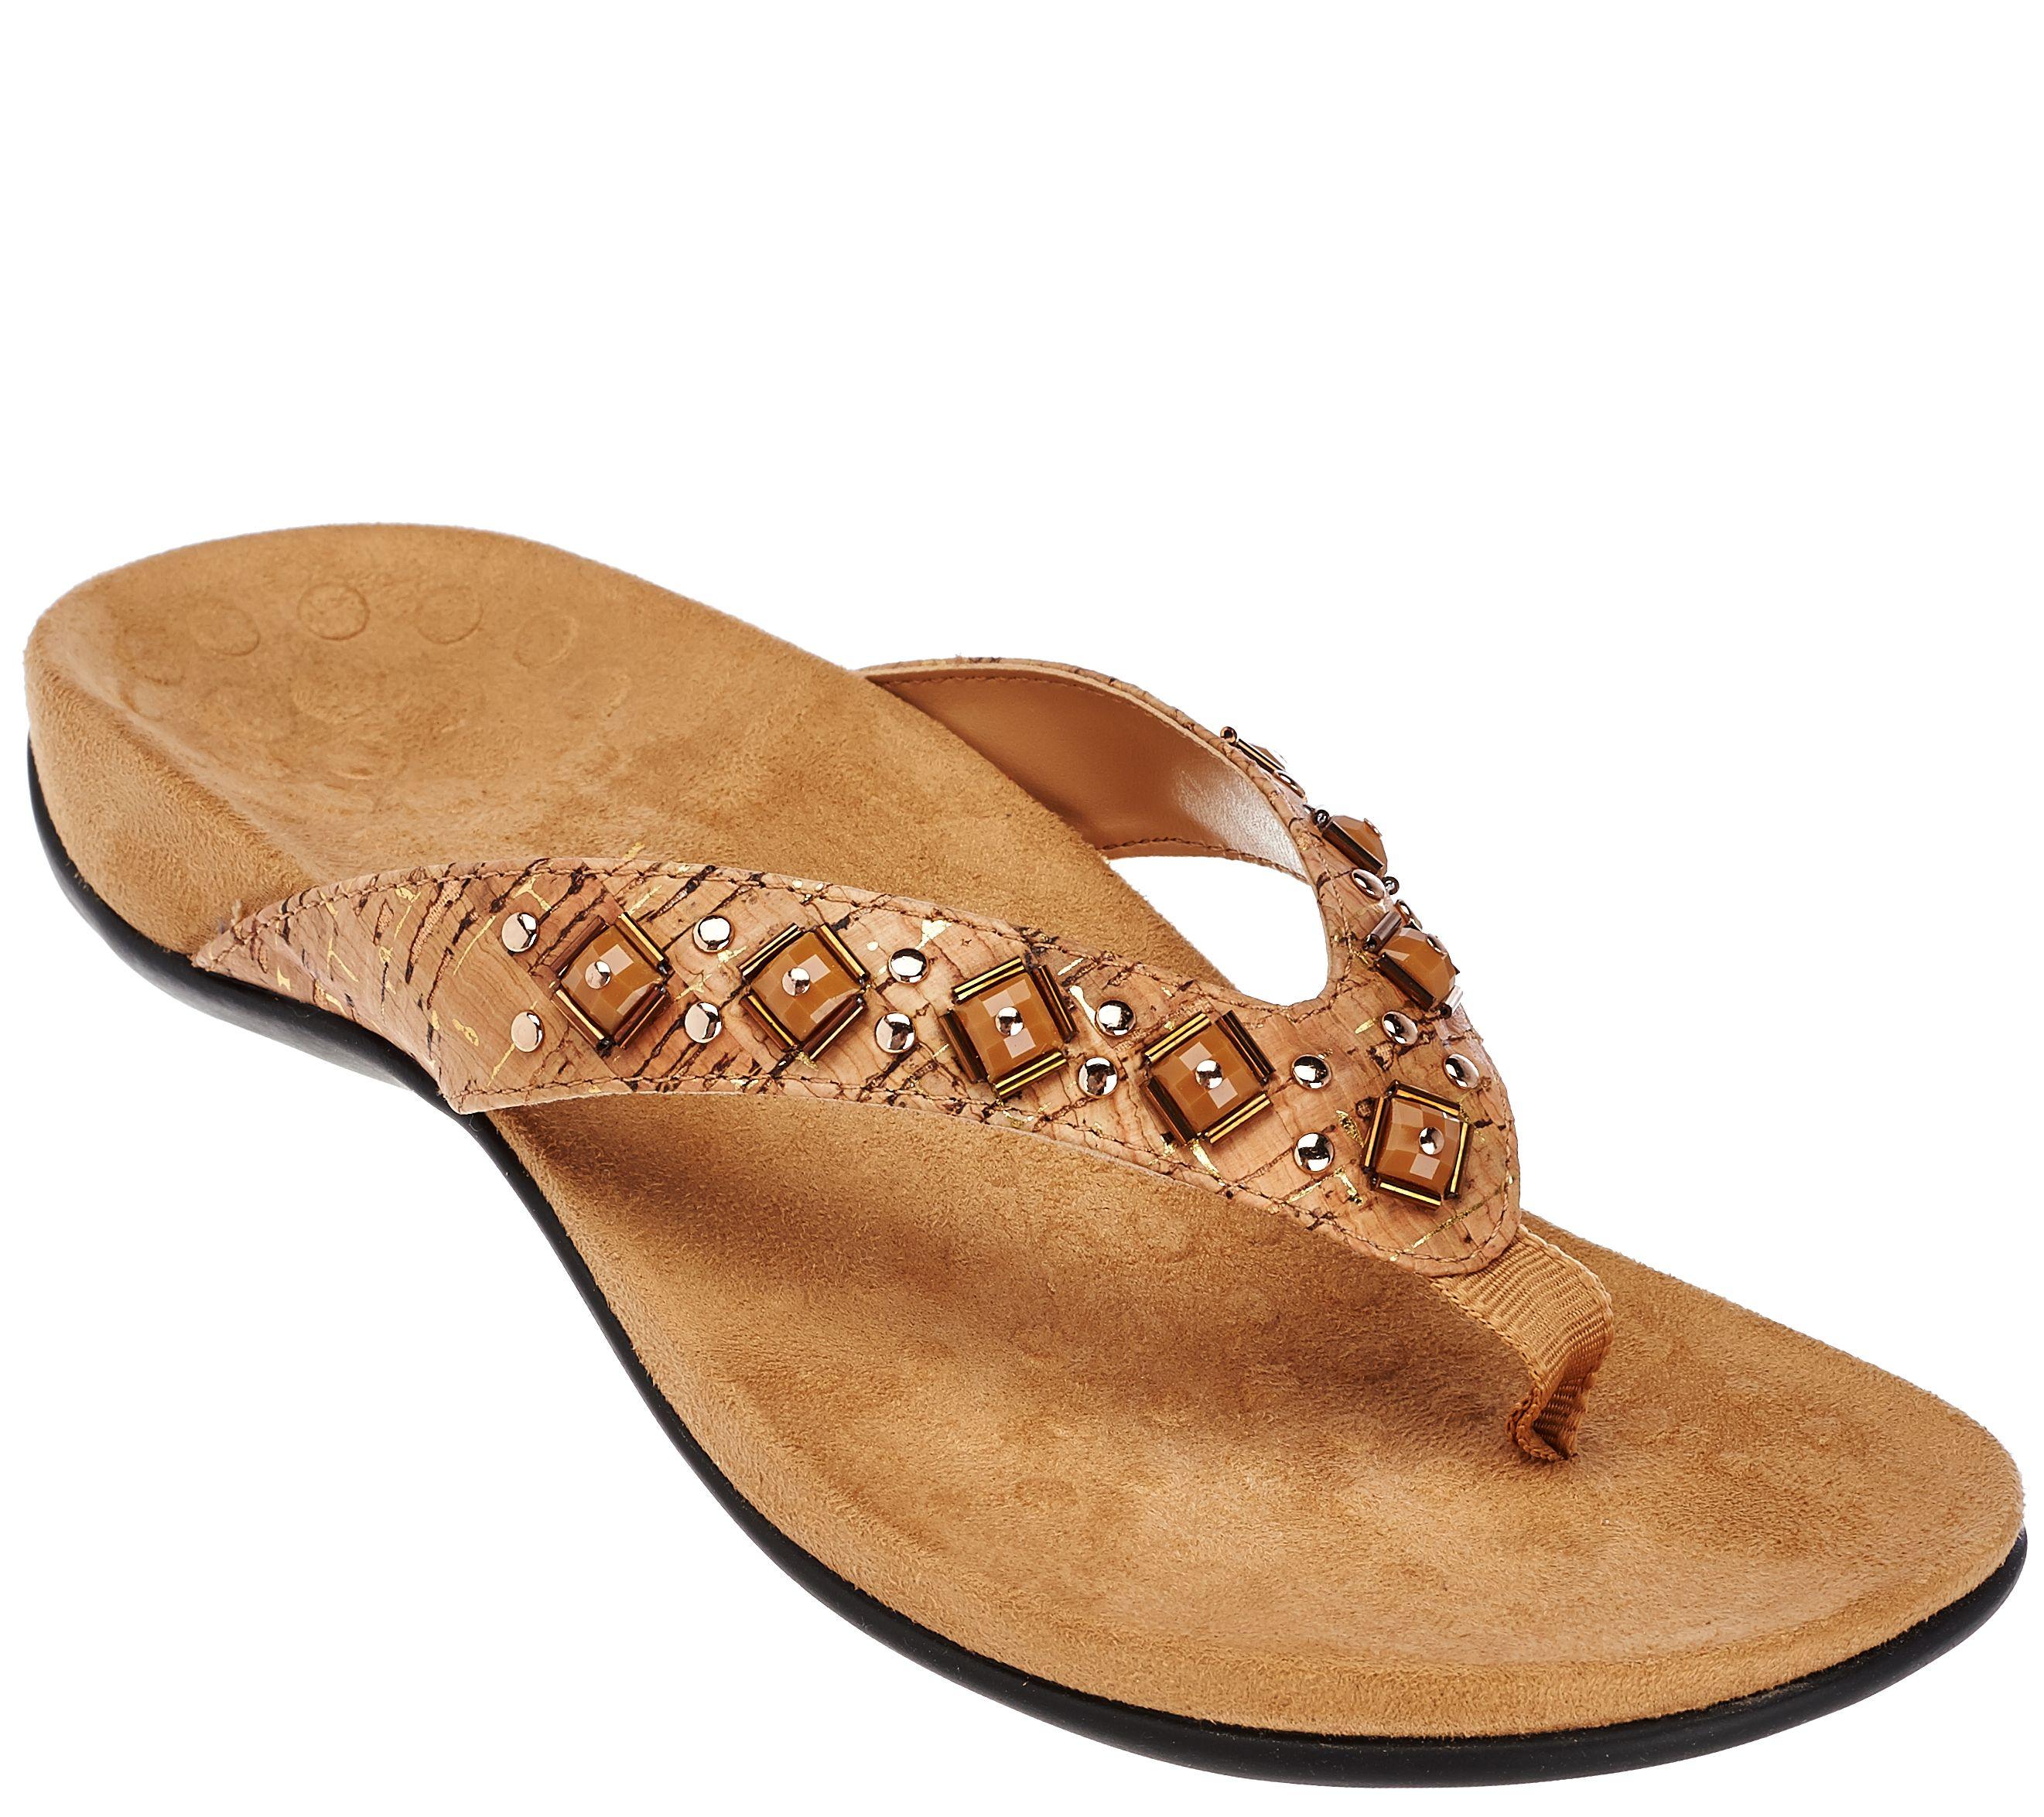 8cbd2665de67f2 Vionic w  Orthaheel Embellished Thong Sandals - Floriana - Page 1 — QVC.com